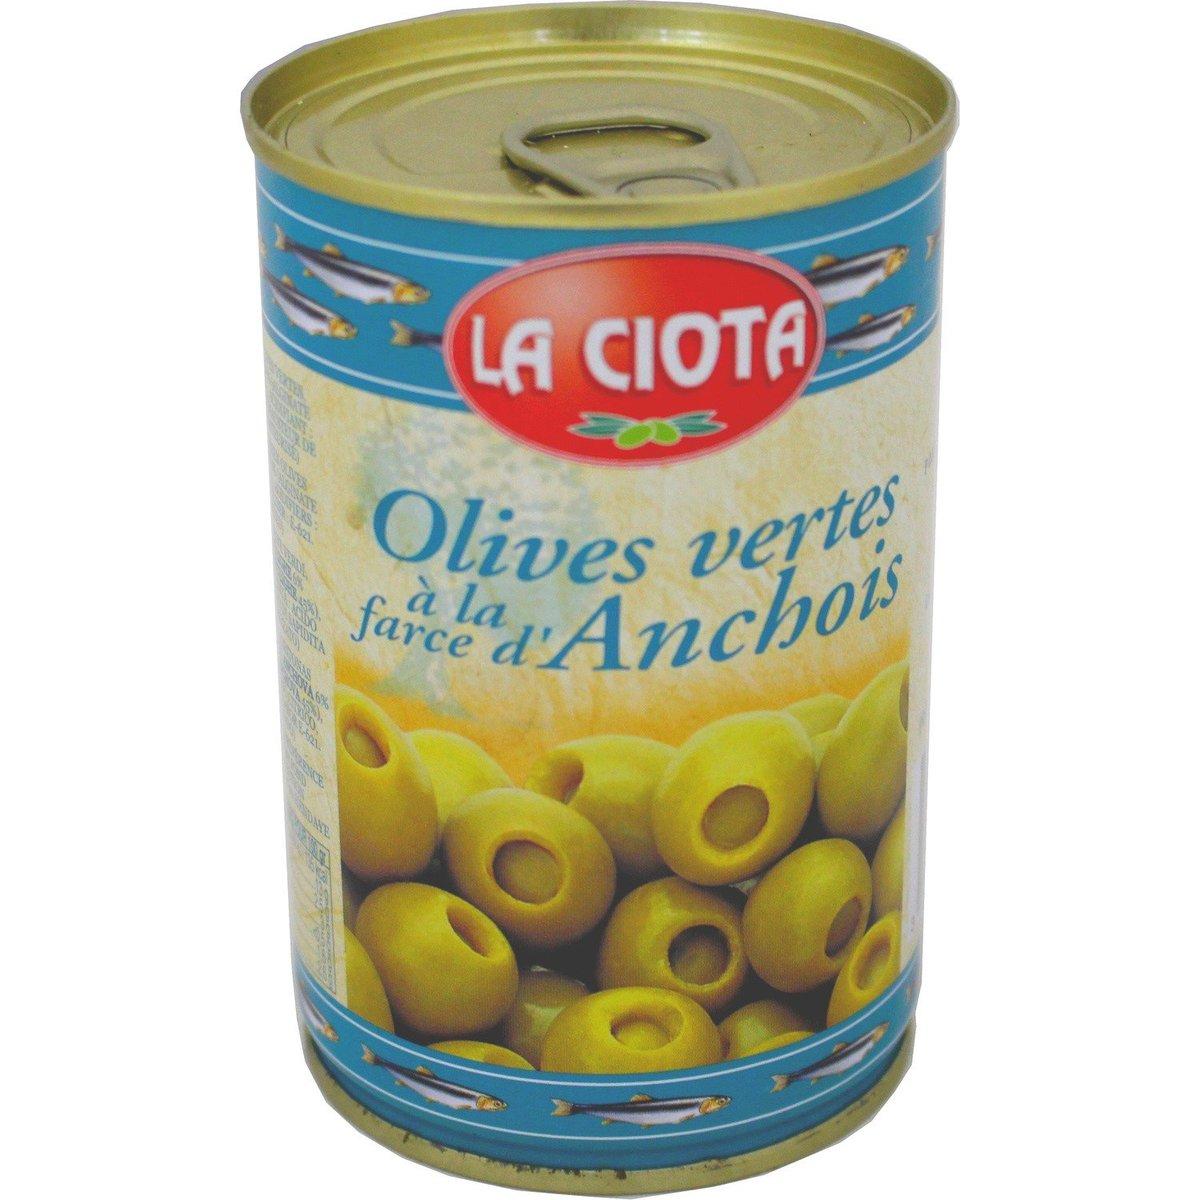 LA CIOTAT - Anchovy Filled Olives - 120g